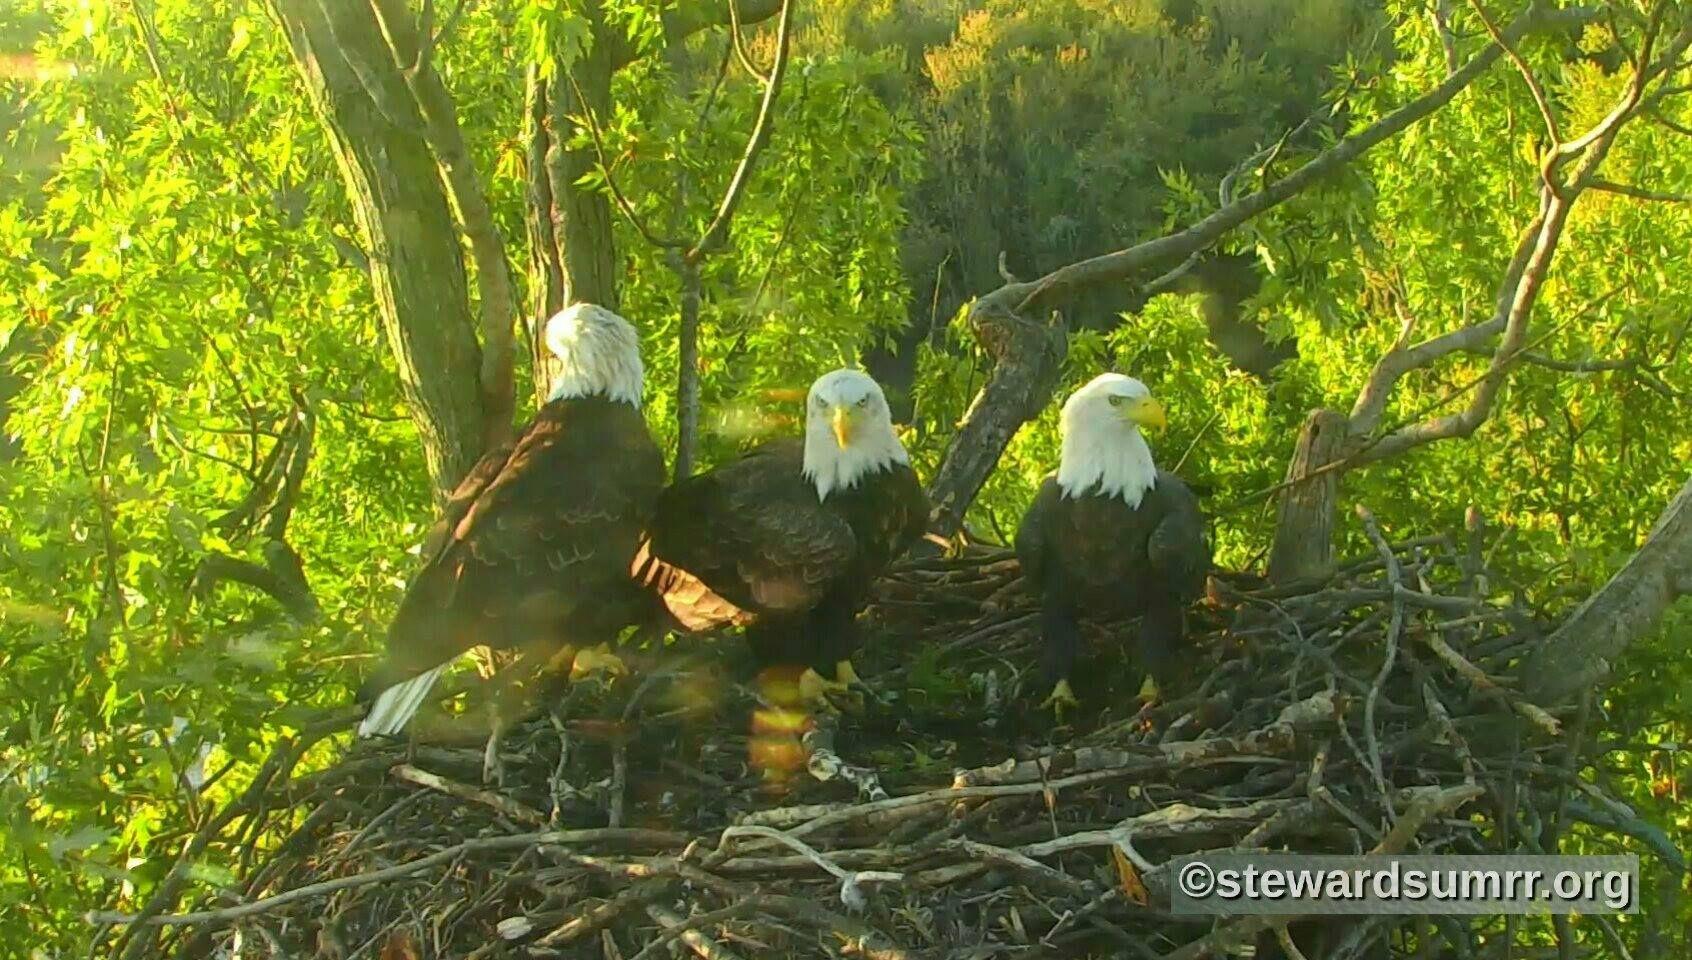 13+ Eagles nest animal hospital ideas